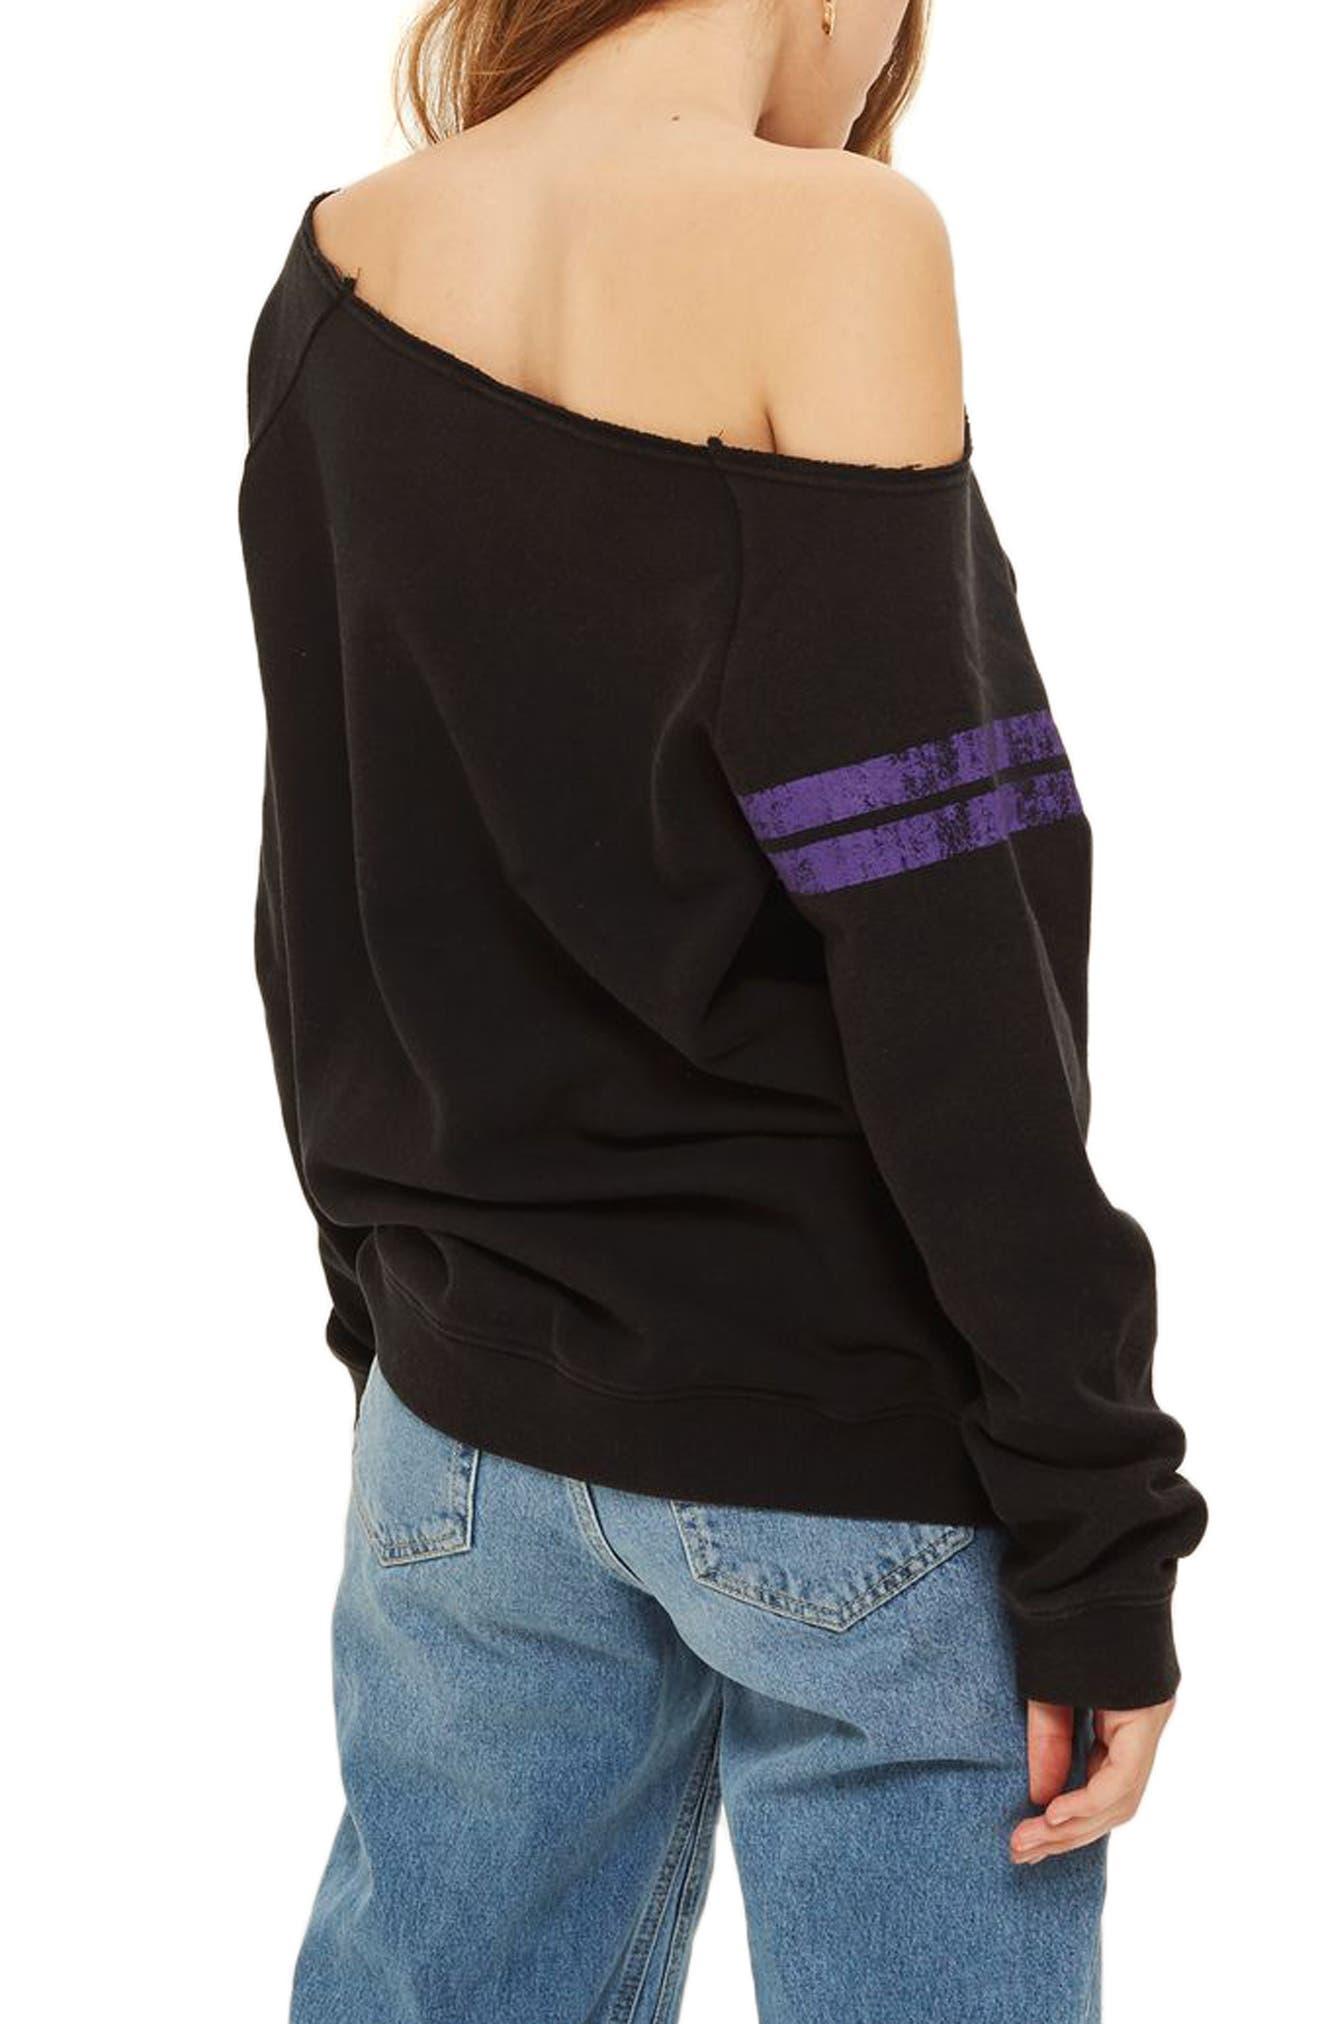 x UNK Lakers Convertible Sweatshirt,                             Alternate thumbnail 3, color,                             Black Multi